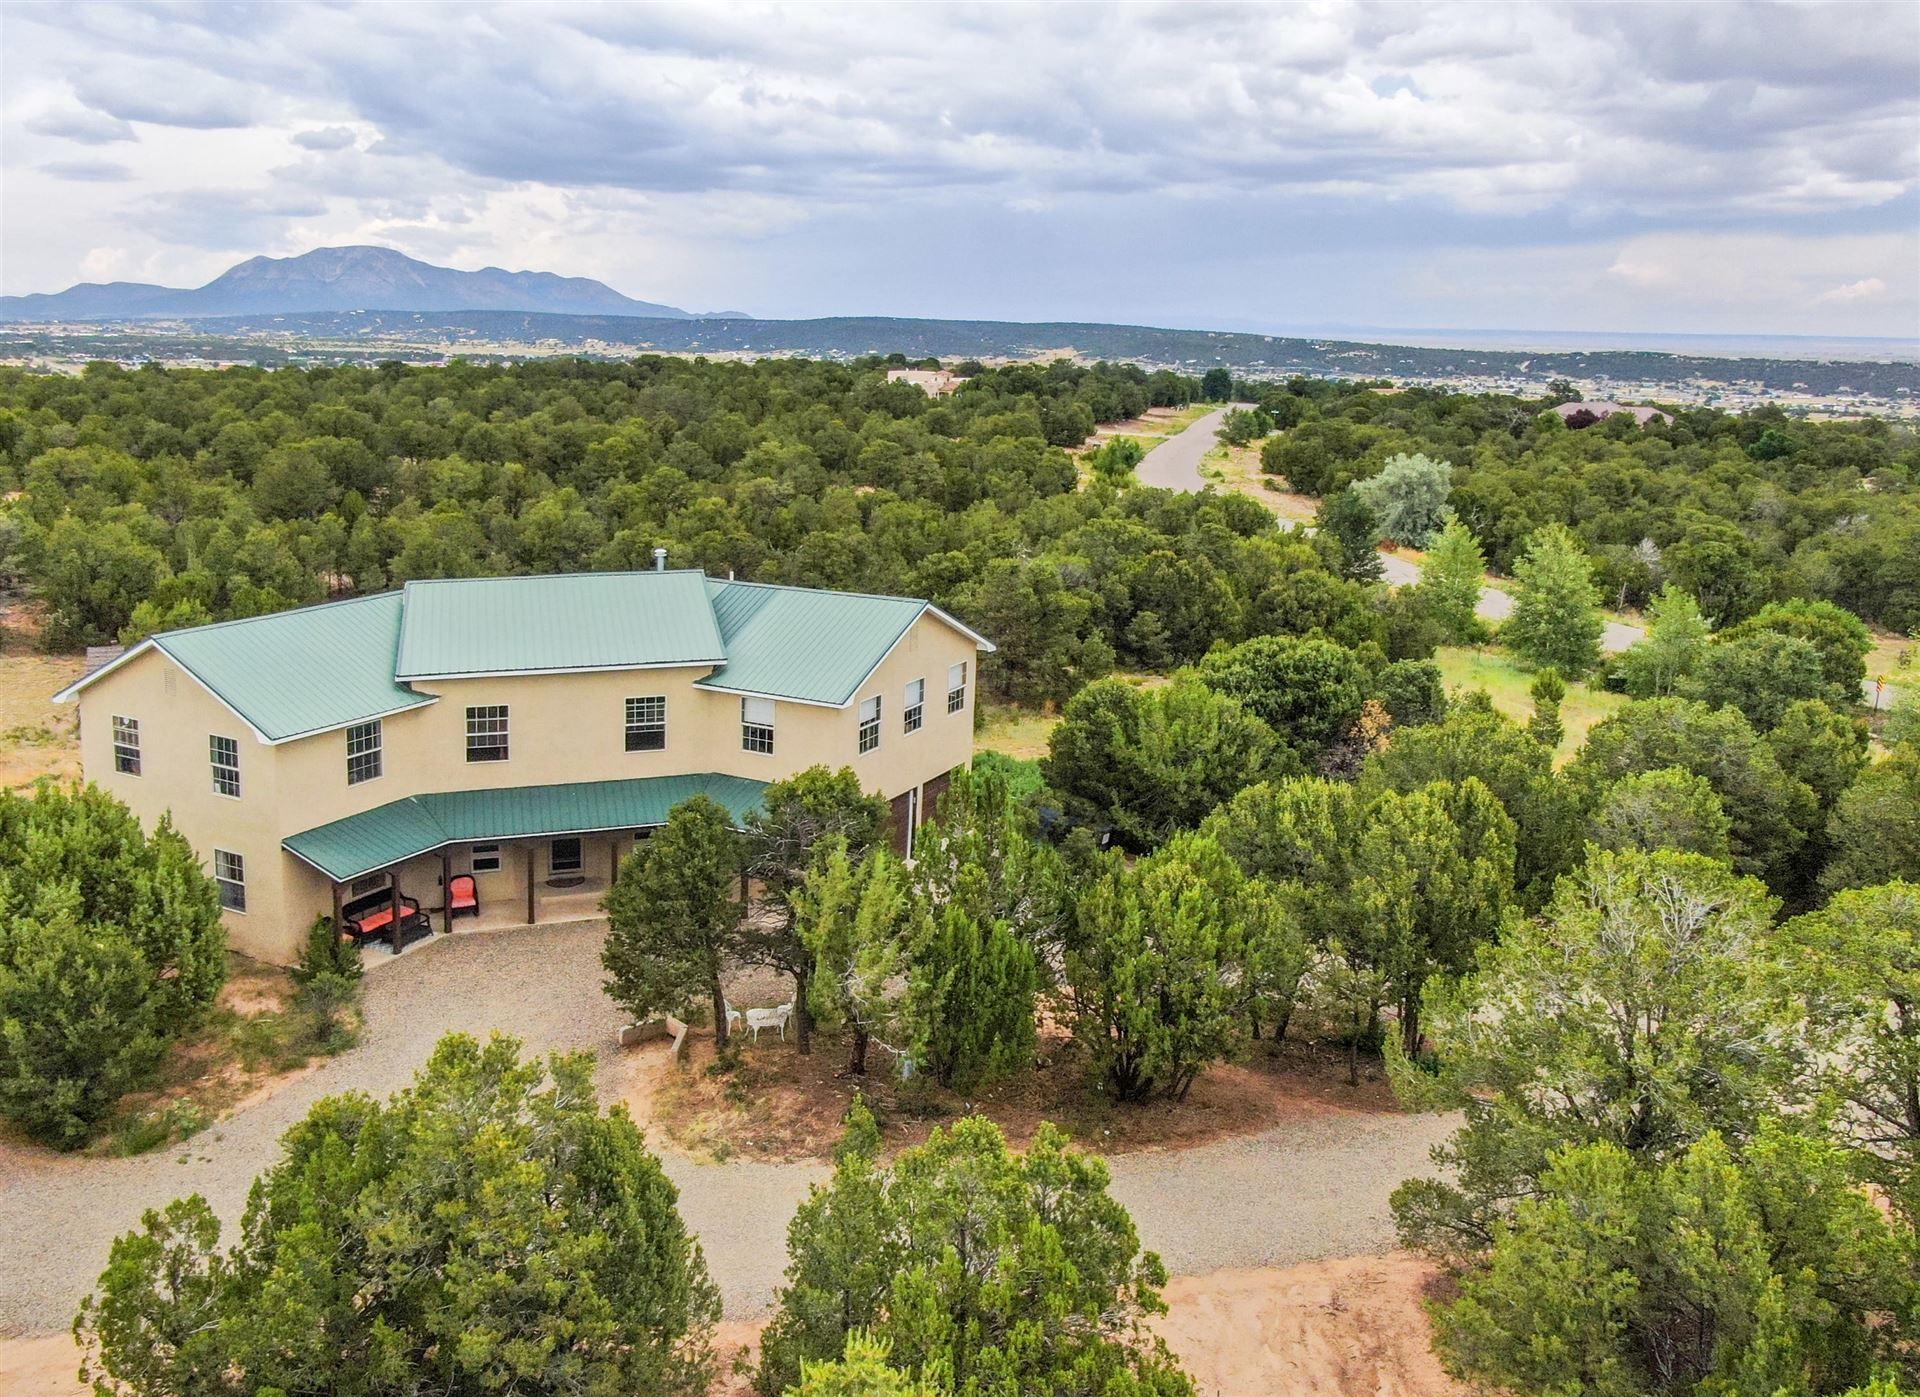 22 Sandia Mountain Ranch Drive, Tijeras, NM 87059 - MLS#: 989265